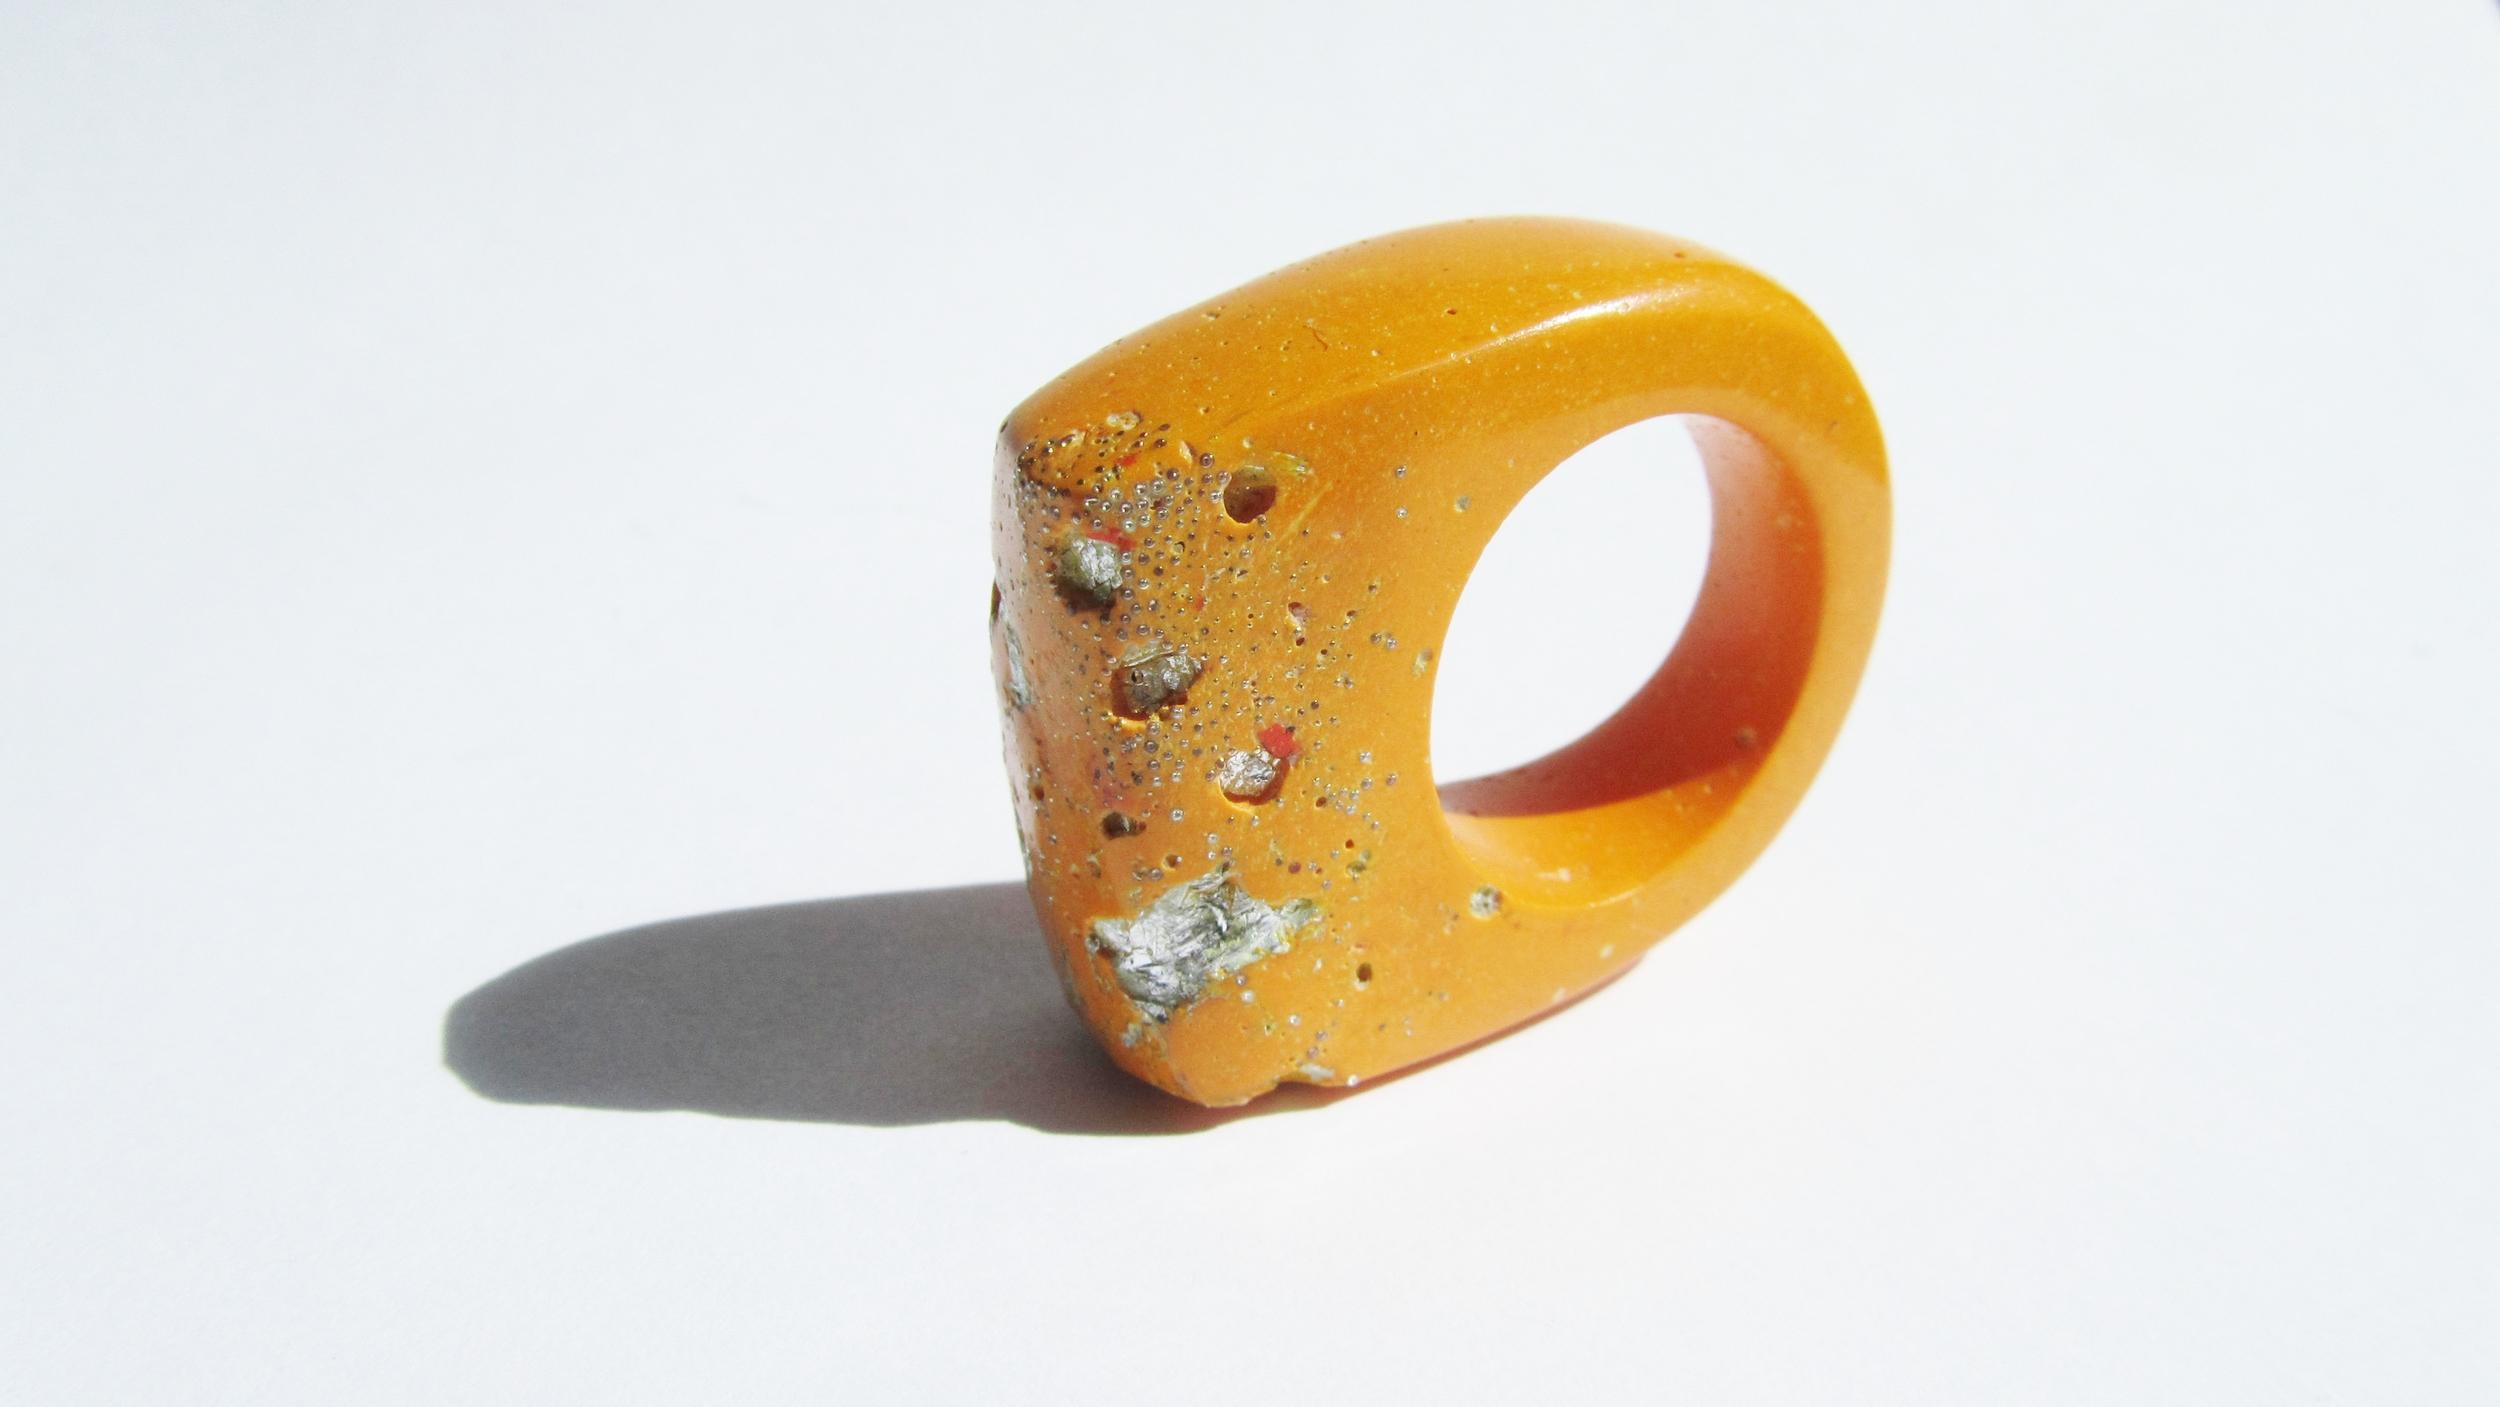 jade mellor hewn ring orange silver metallic caviar Q 3.JPG